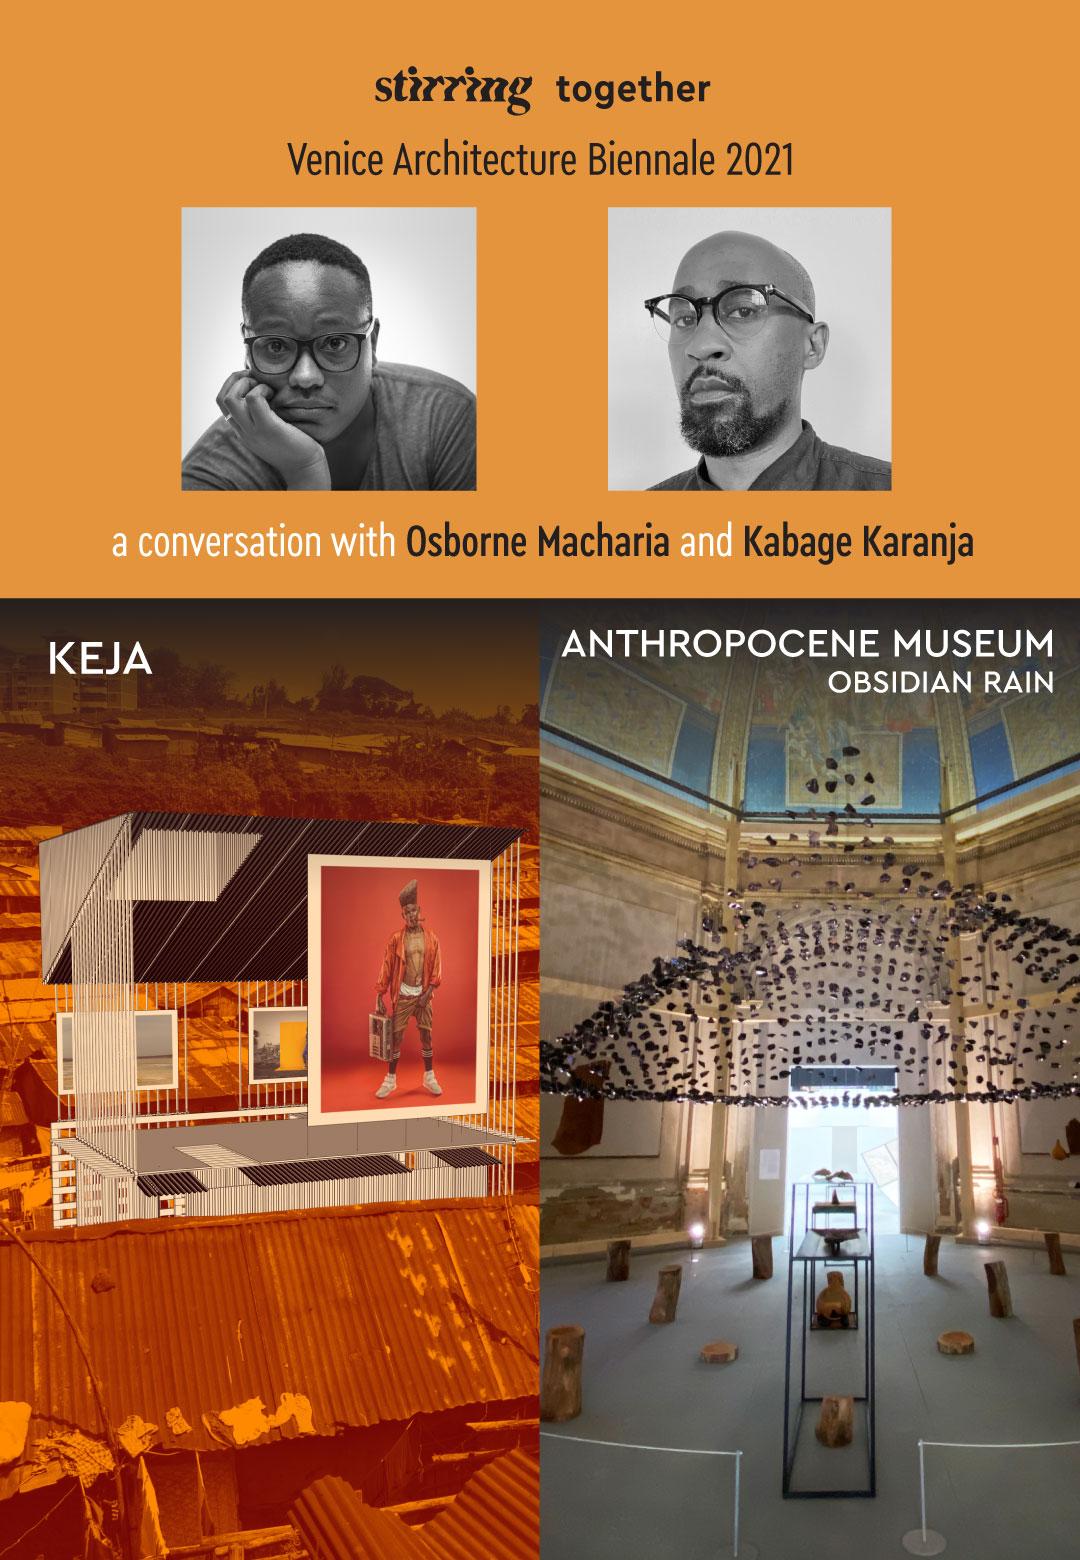 STIR's exclusive conversation with Osborne Macharia and Kabage Karanja on KEJA and Obsidian Rain, the third exhibit in the Anthropocene Museum project | KEJA and Obsidian Rain | Osborne Macharia, Kabage Karanja | STIRworld